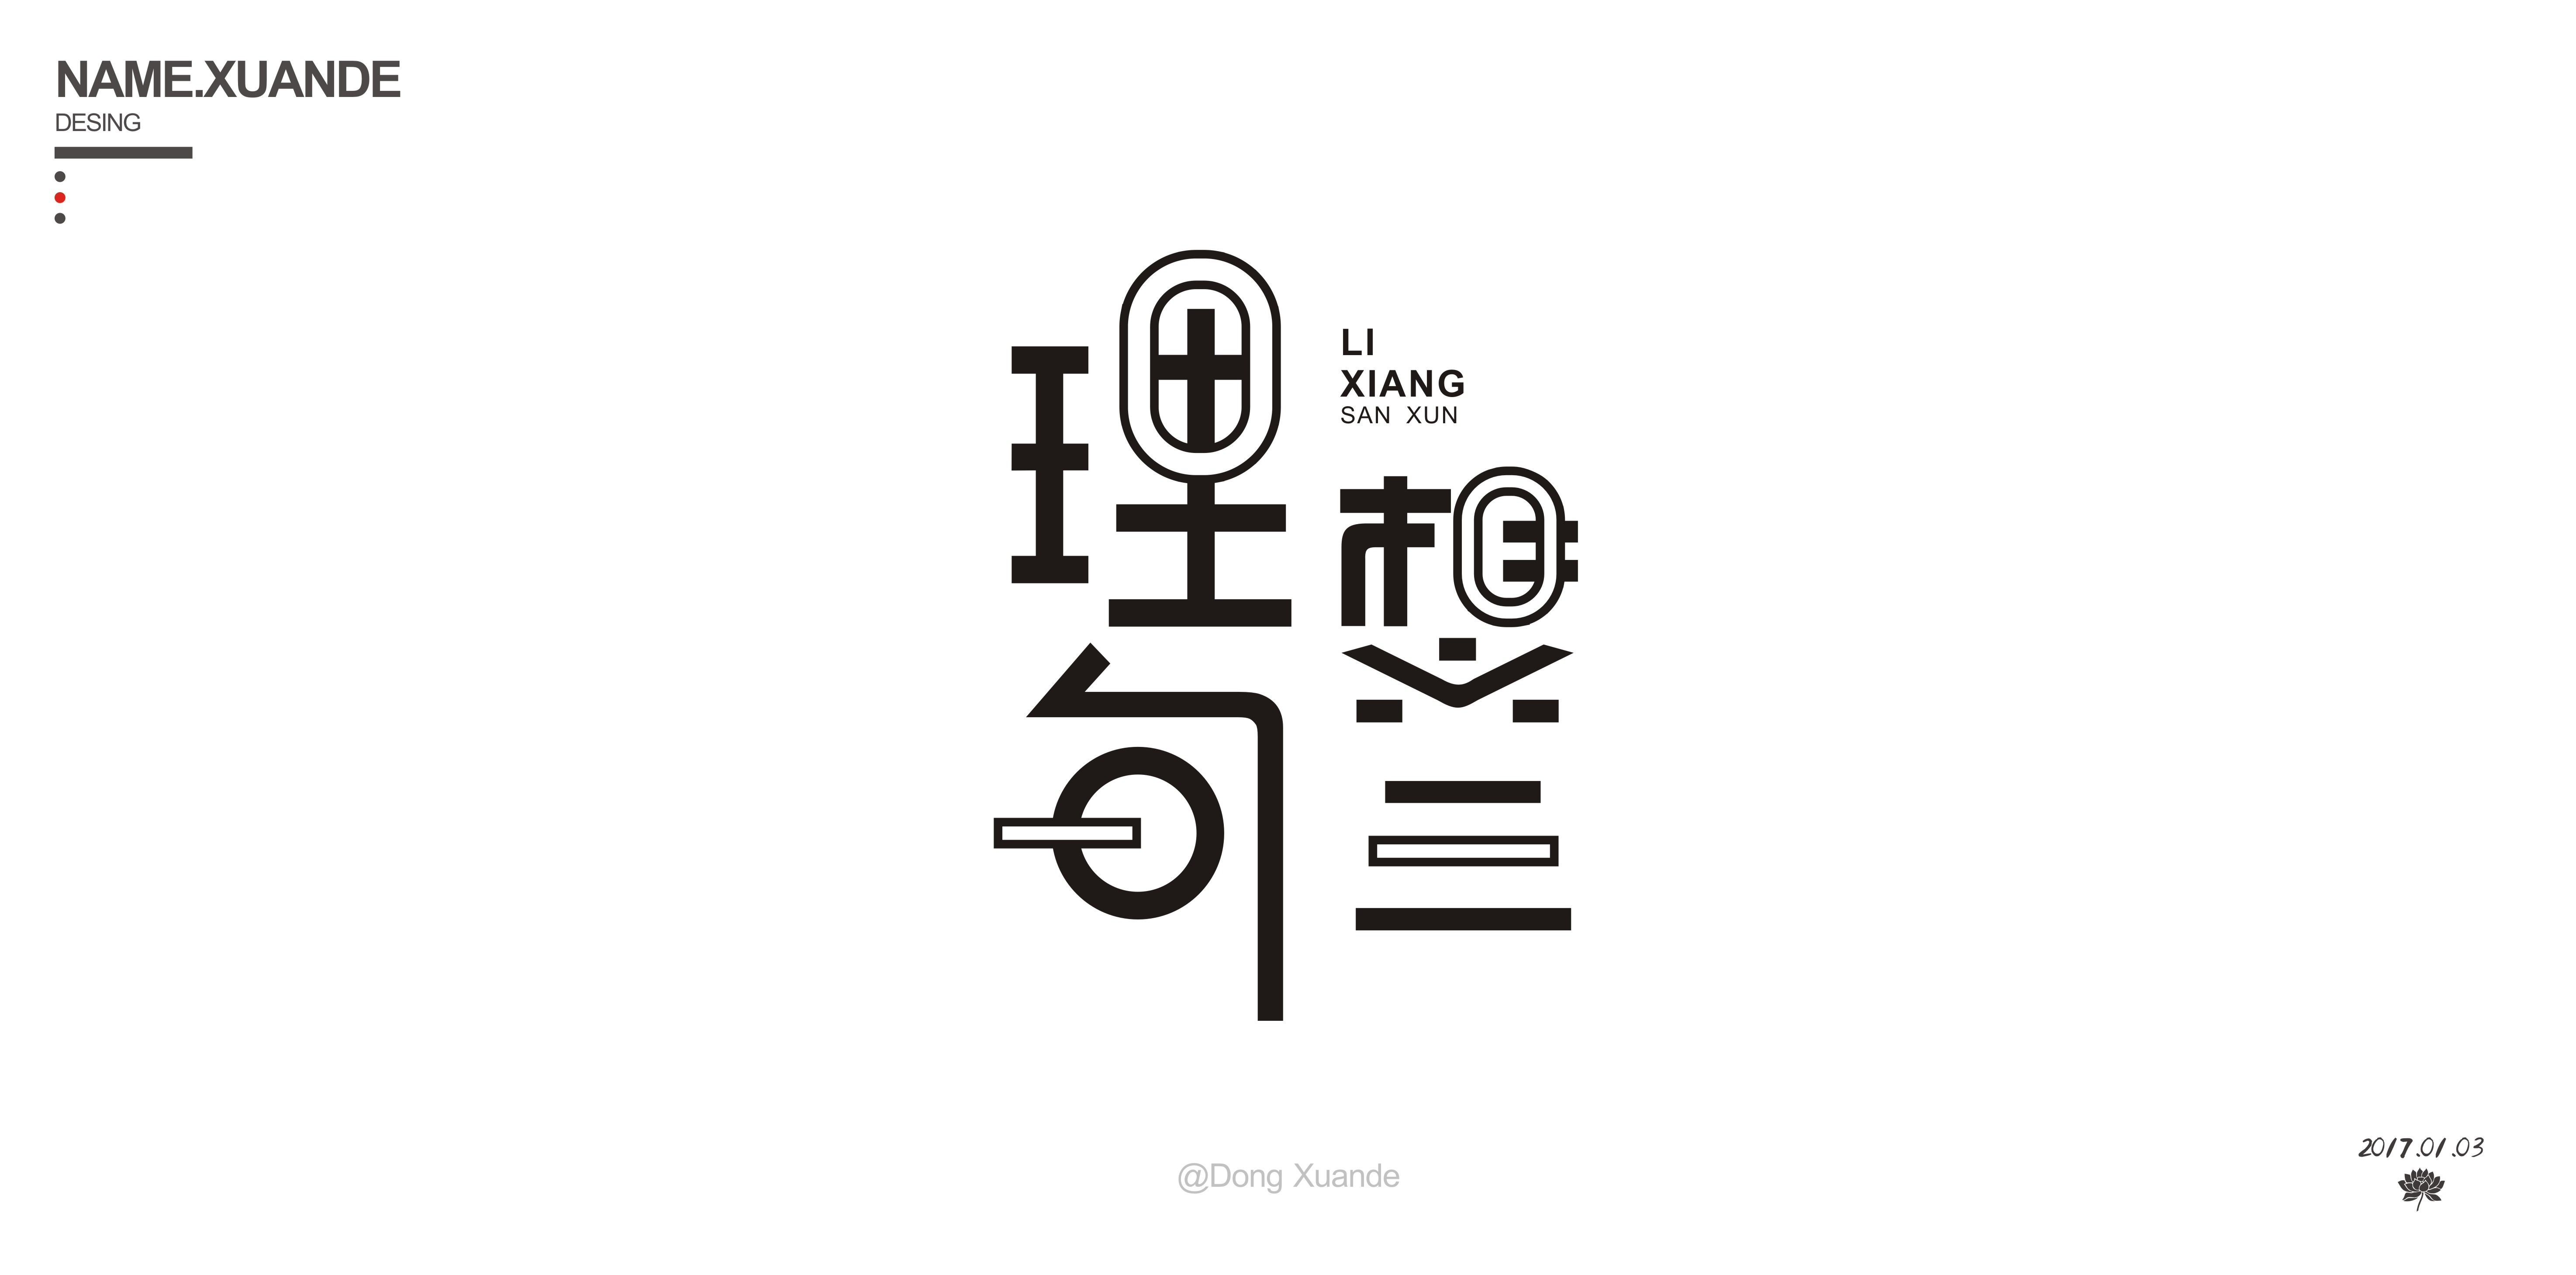 2017丨字体练习丨第二篇